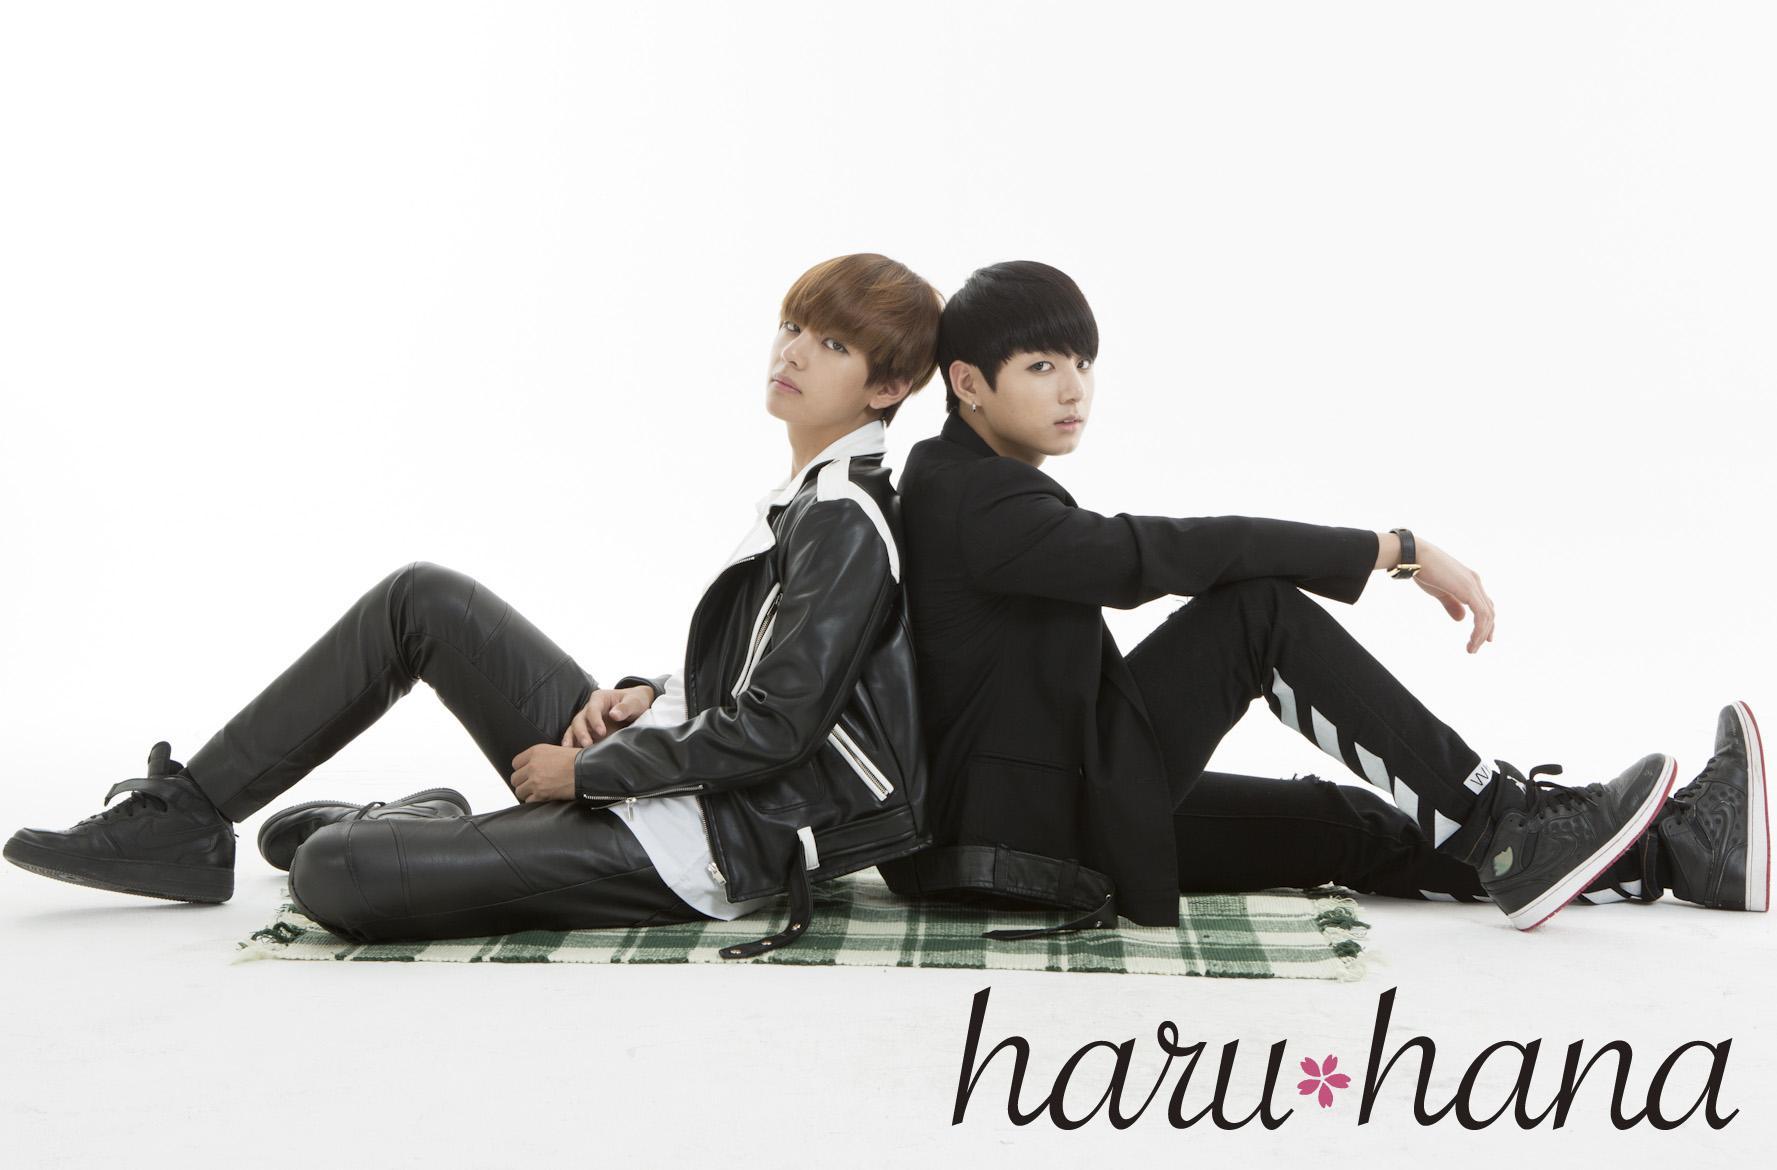 Picture SugaV amp Jungkook at Haru Hana twitter 141230 : B6E5oKVCUAAjWP from btsdiary.com size 1777 x 1170 jpeg 118kB